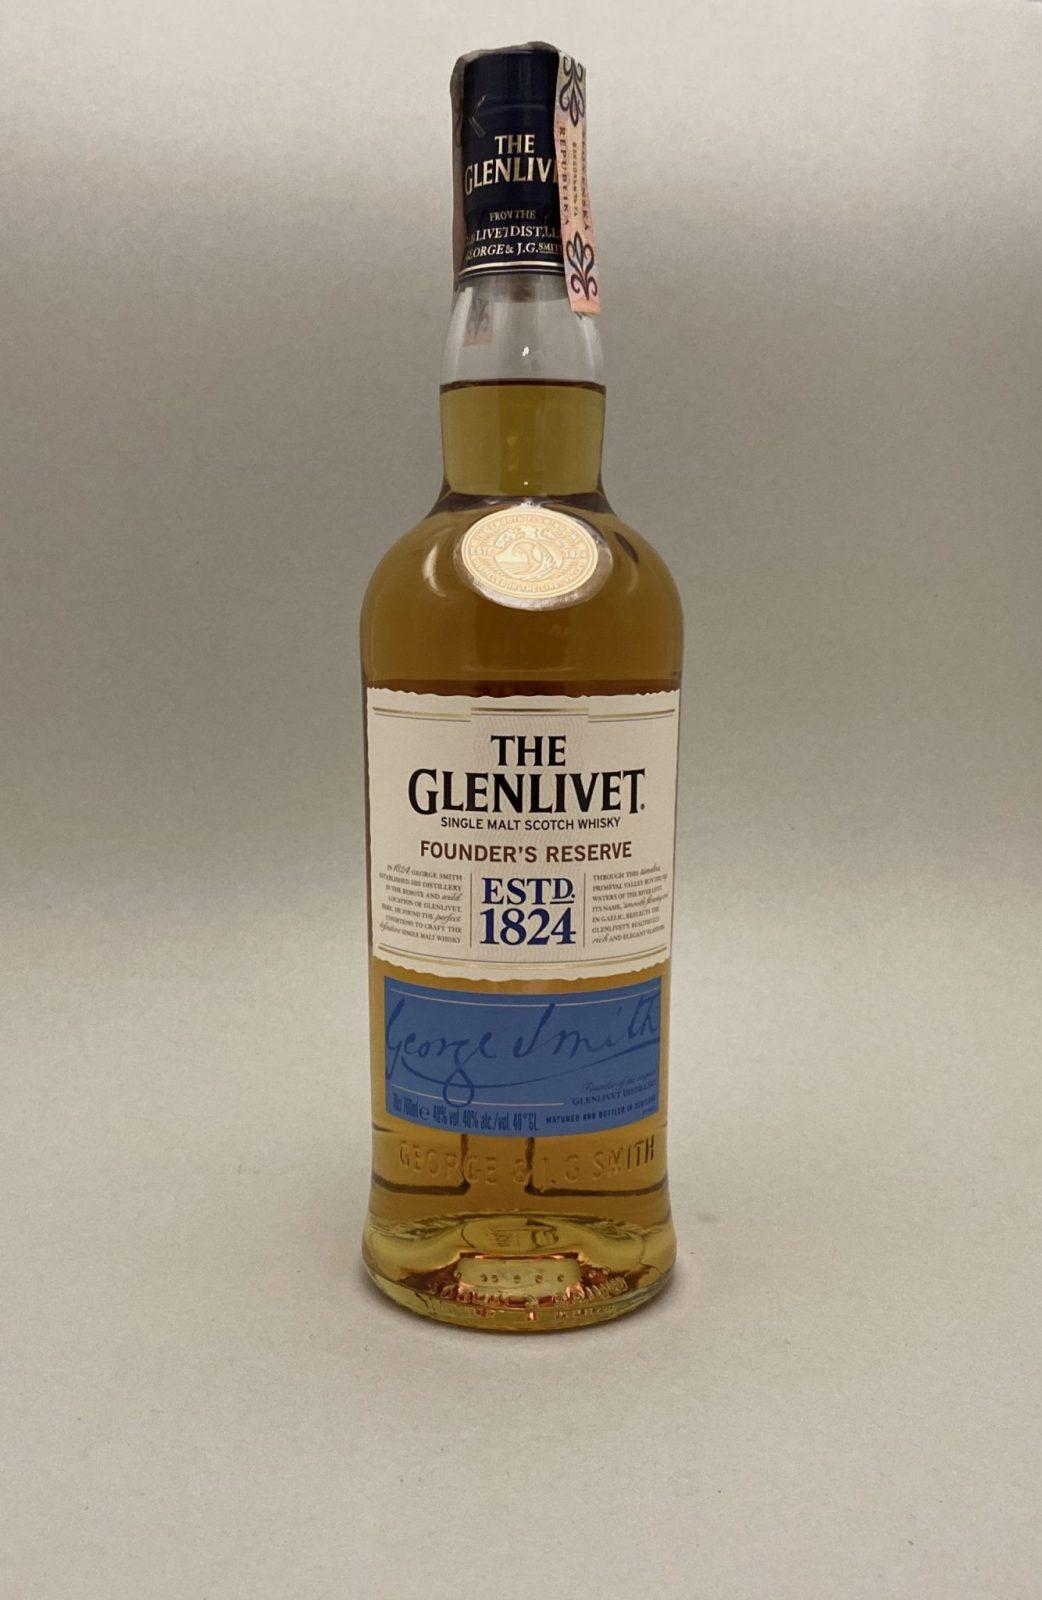 The Glenlivet Founder's Reserve 40%, Bottleshop Sunny wines slnecnice mesto, petrzalka, Škótska Whisky, rozvoz alkoholu, eshop